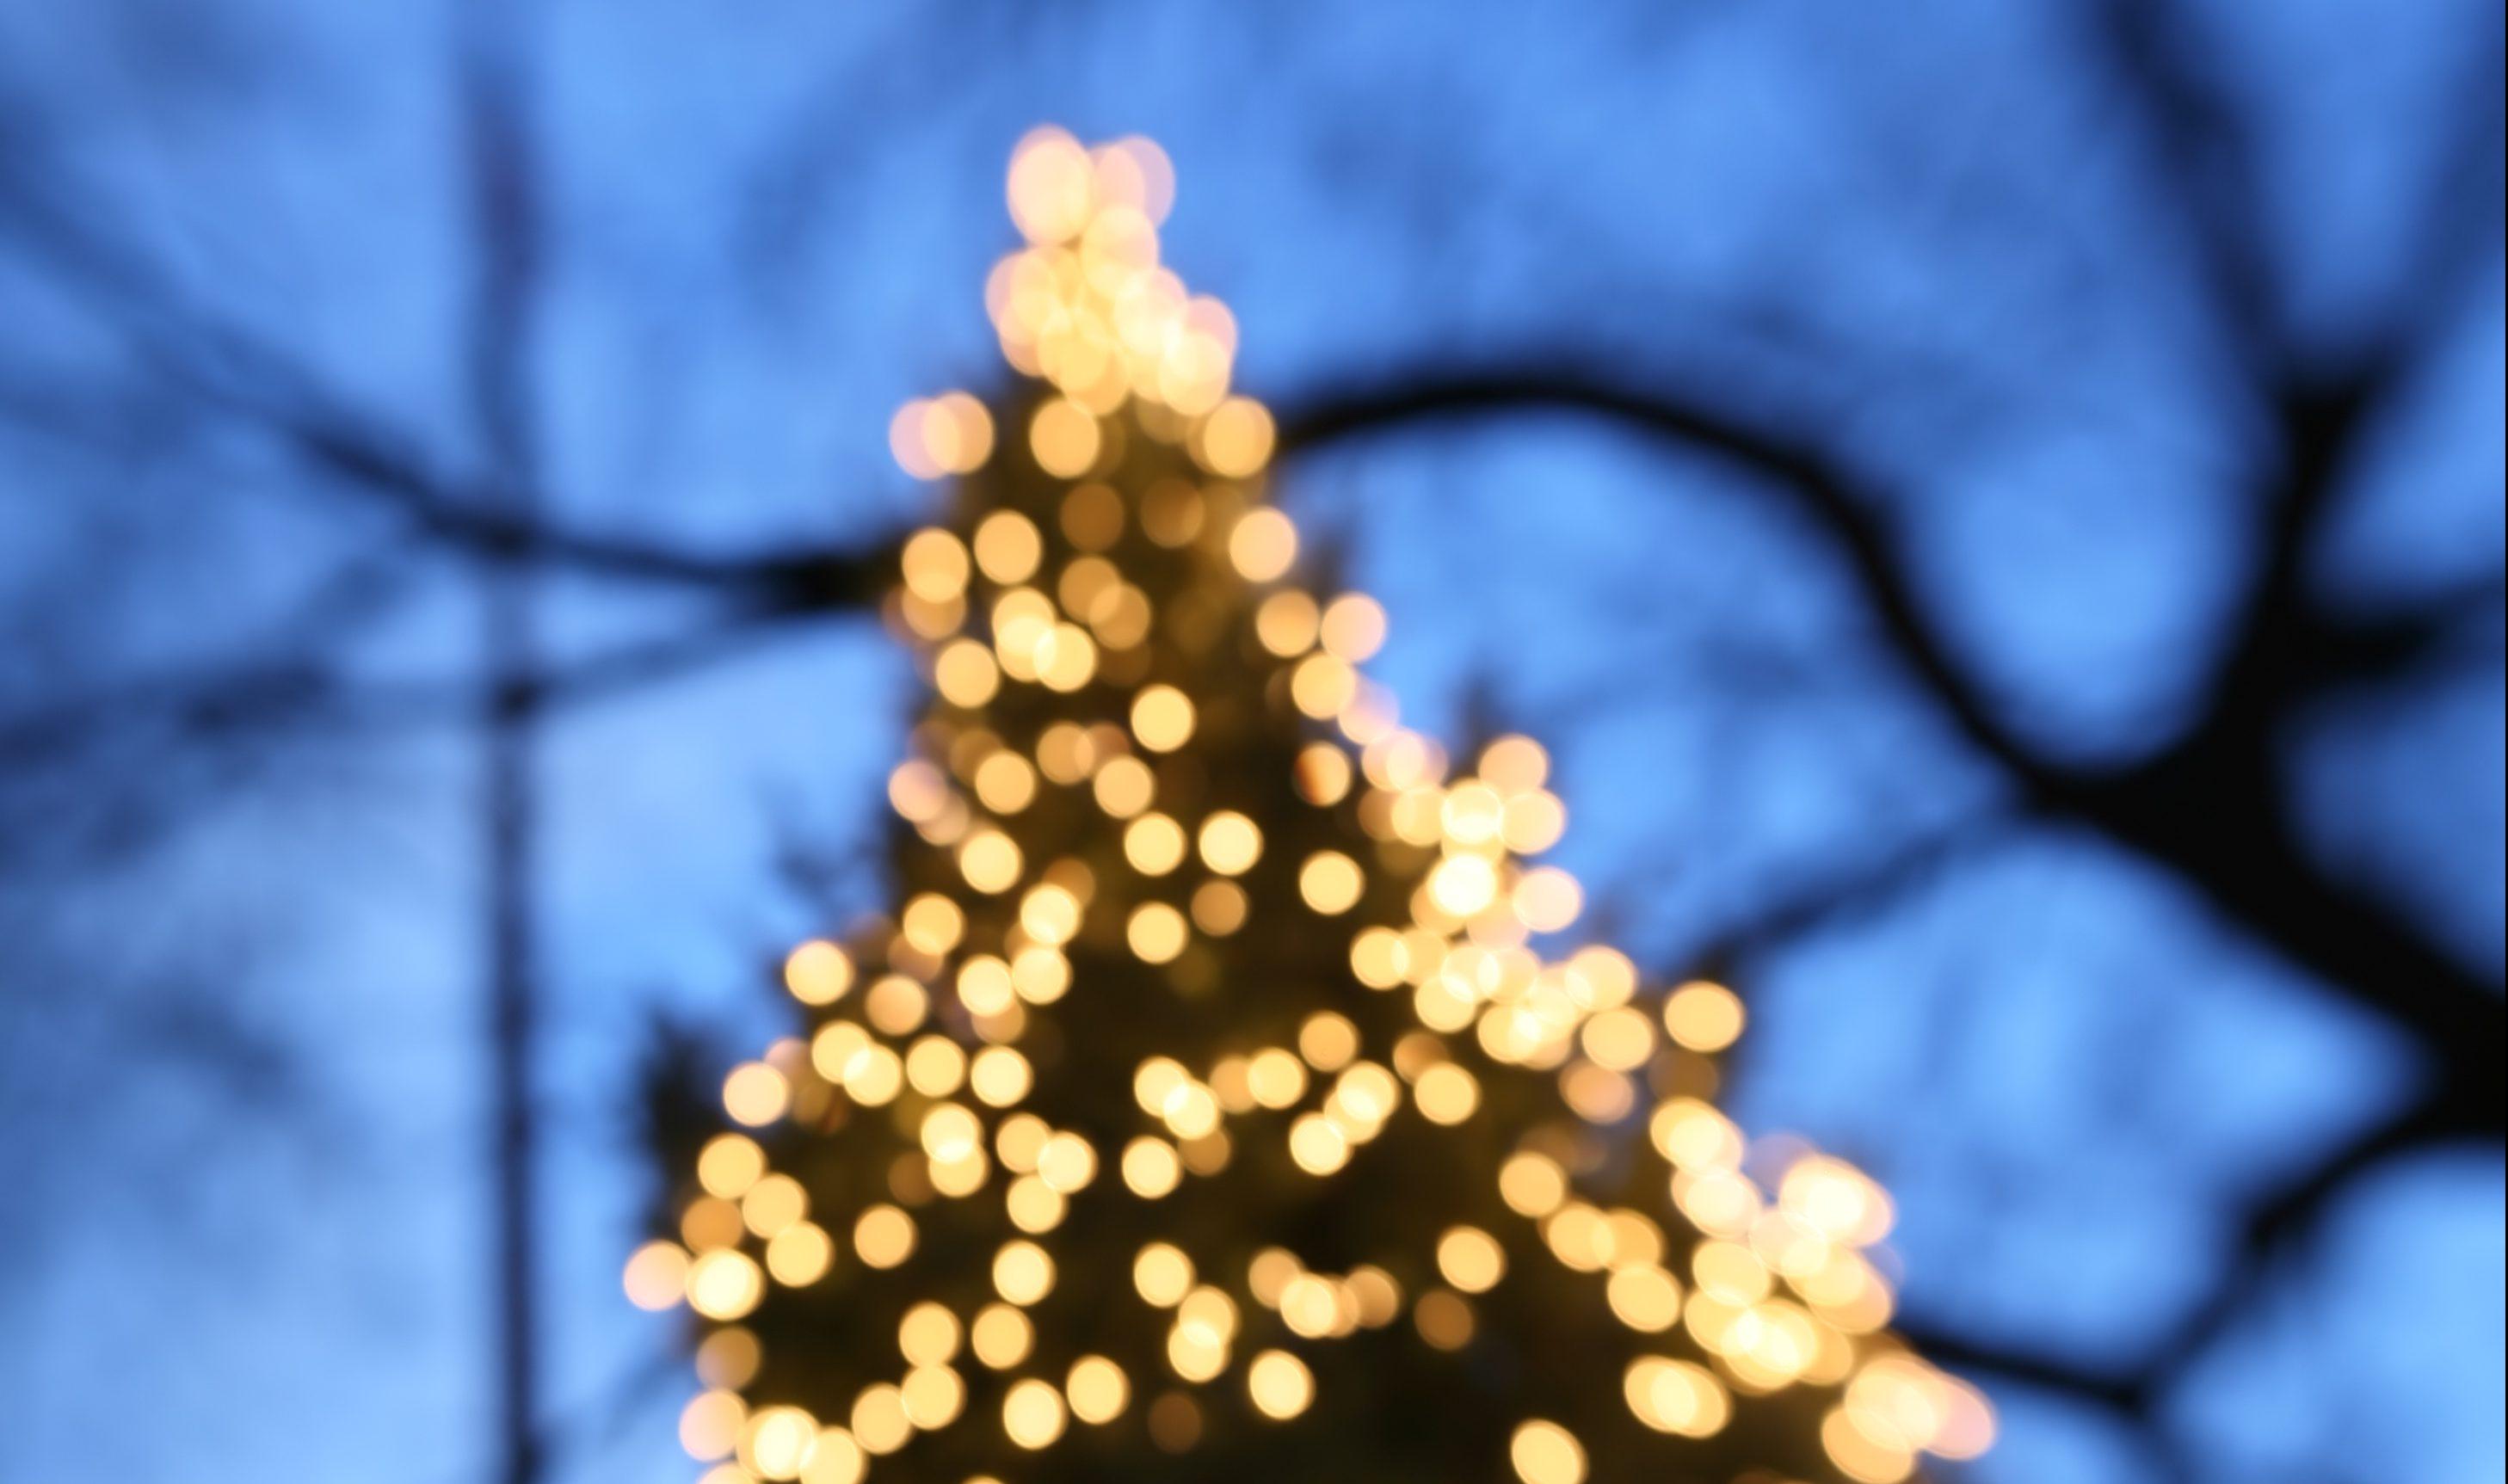 Chicago Christmas Radio Stations 2021 Christmas Music Starts Playing On Chicago Radio Station Thursday Wgn Tv